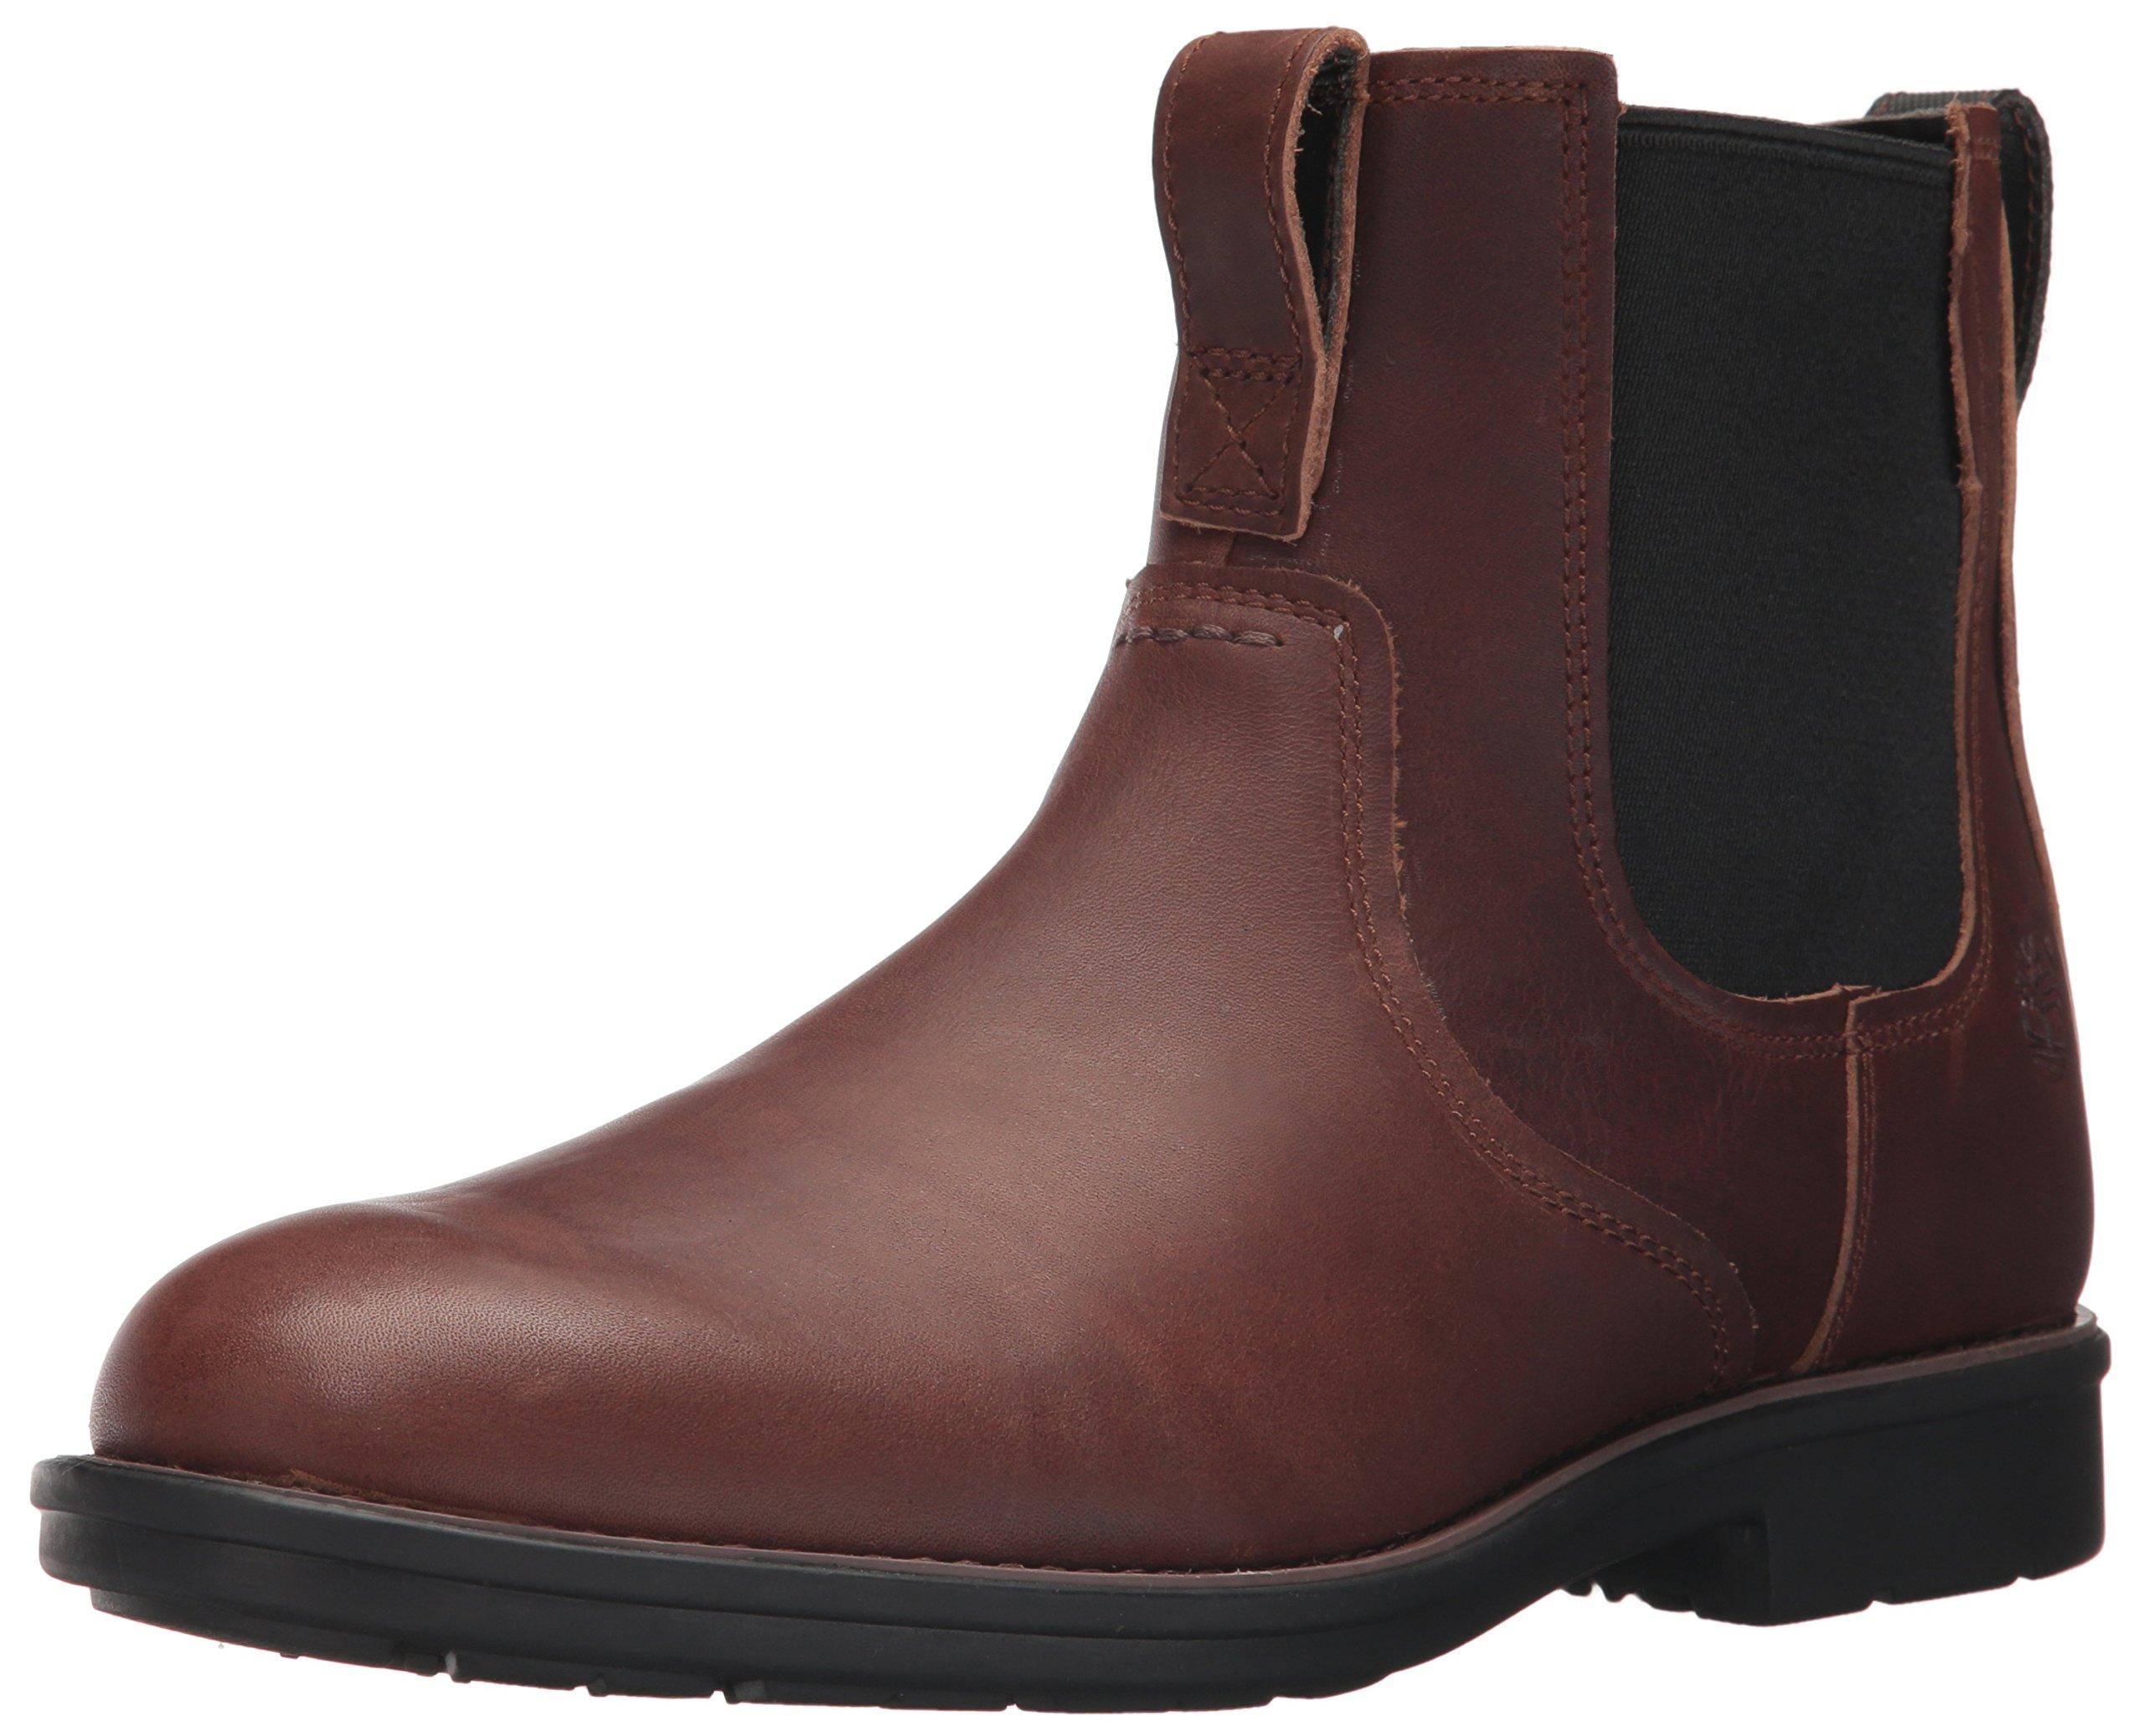 Timberland Men's Carter Notch Chelsea Boot, Dark Brown Full Grain, 10 D(M) US